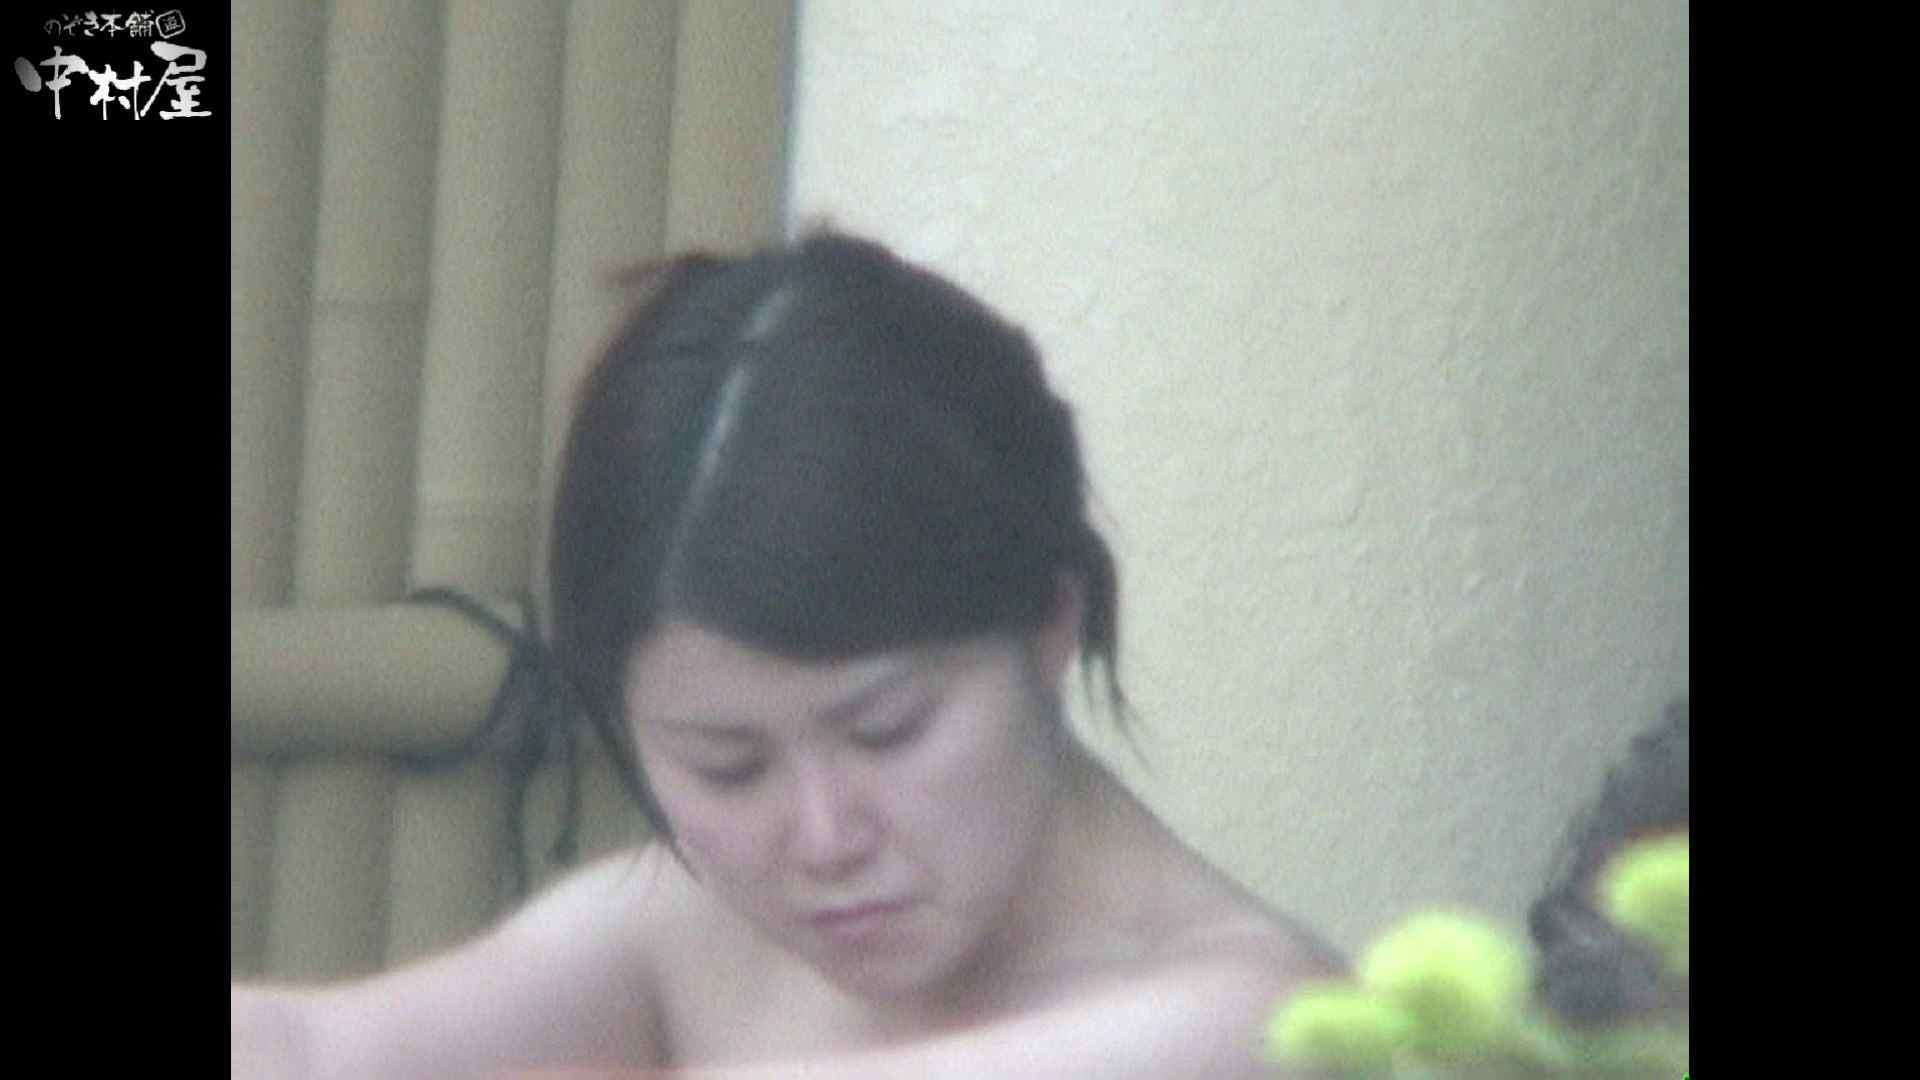 Aquaな露天風呂Vol.935 露天 | OLセックス  106画像 100